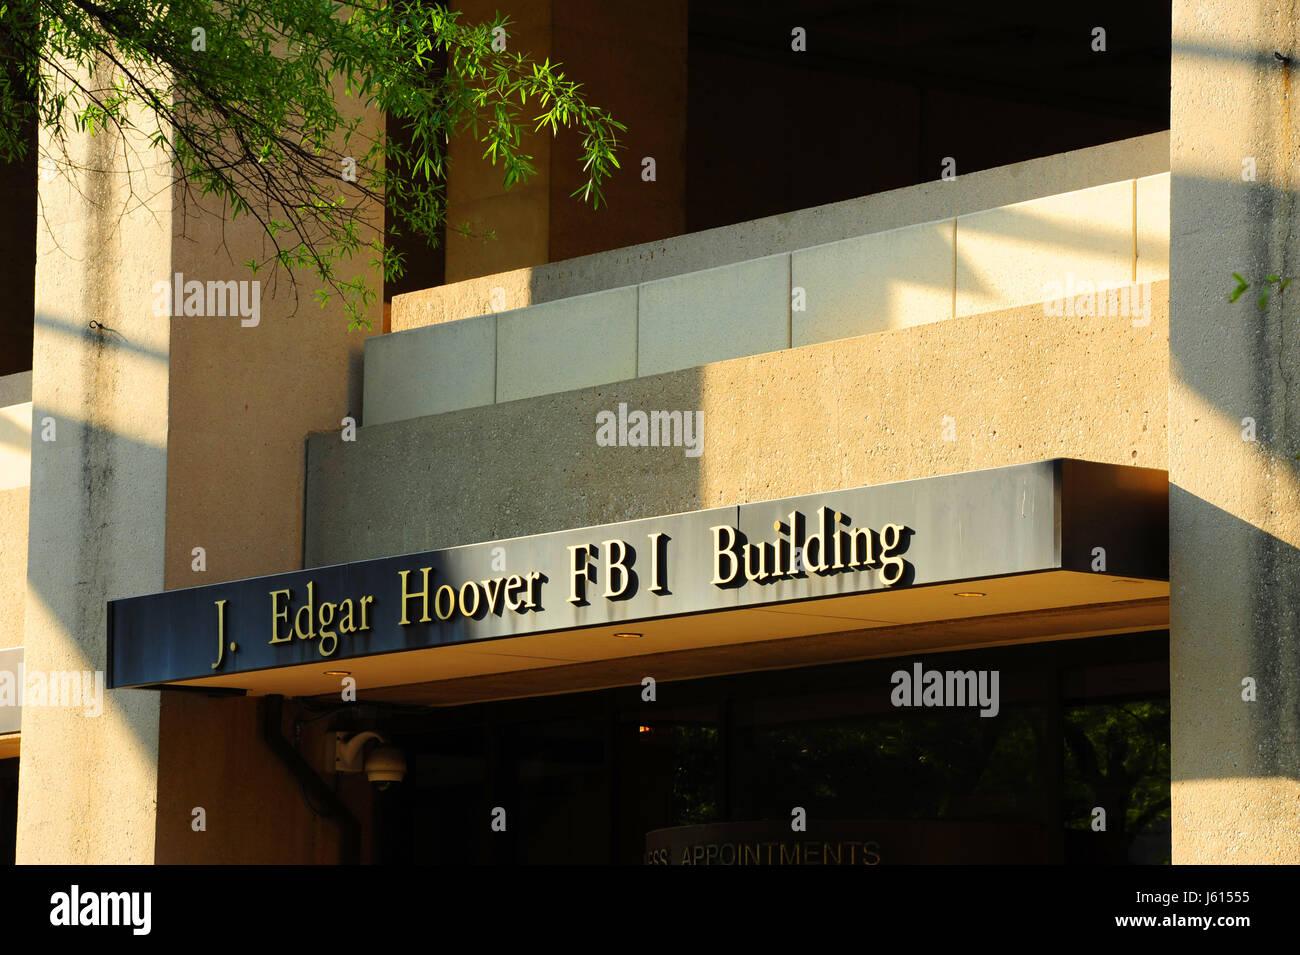 usa-washington-dc-fbi-federal-bureau-of-investigation-j-edgar-hoover-J61555.jpg